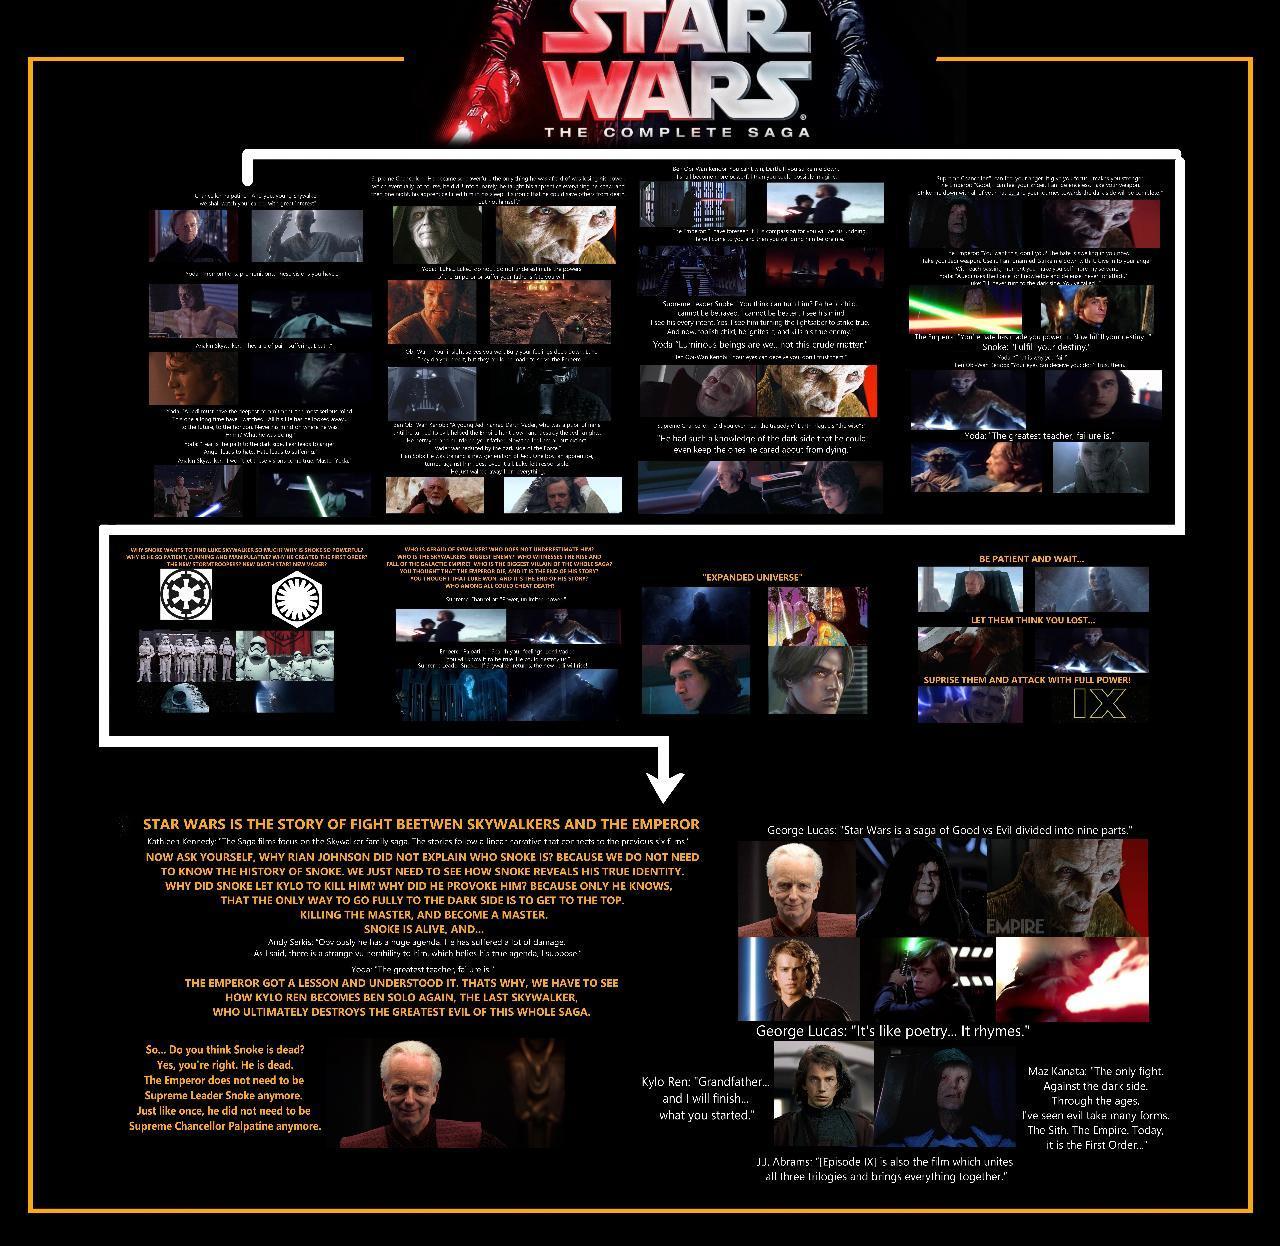 Star Wars Fan Theory Palpatine Snoke Connection